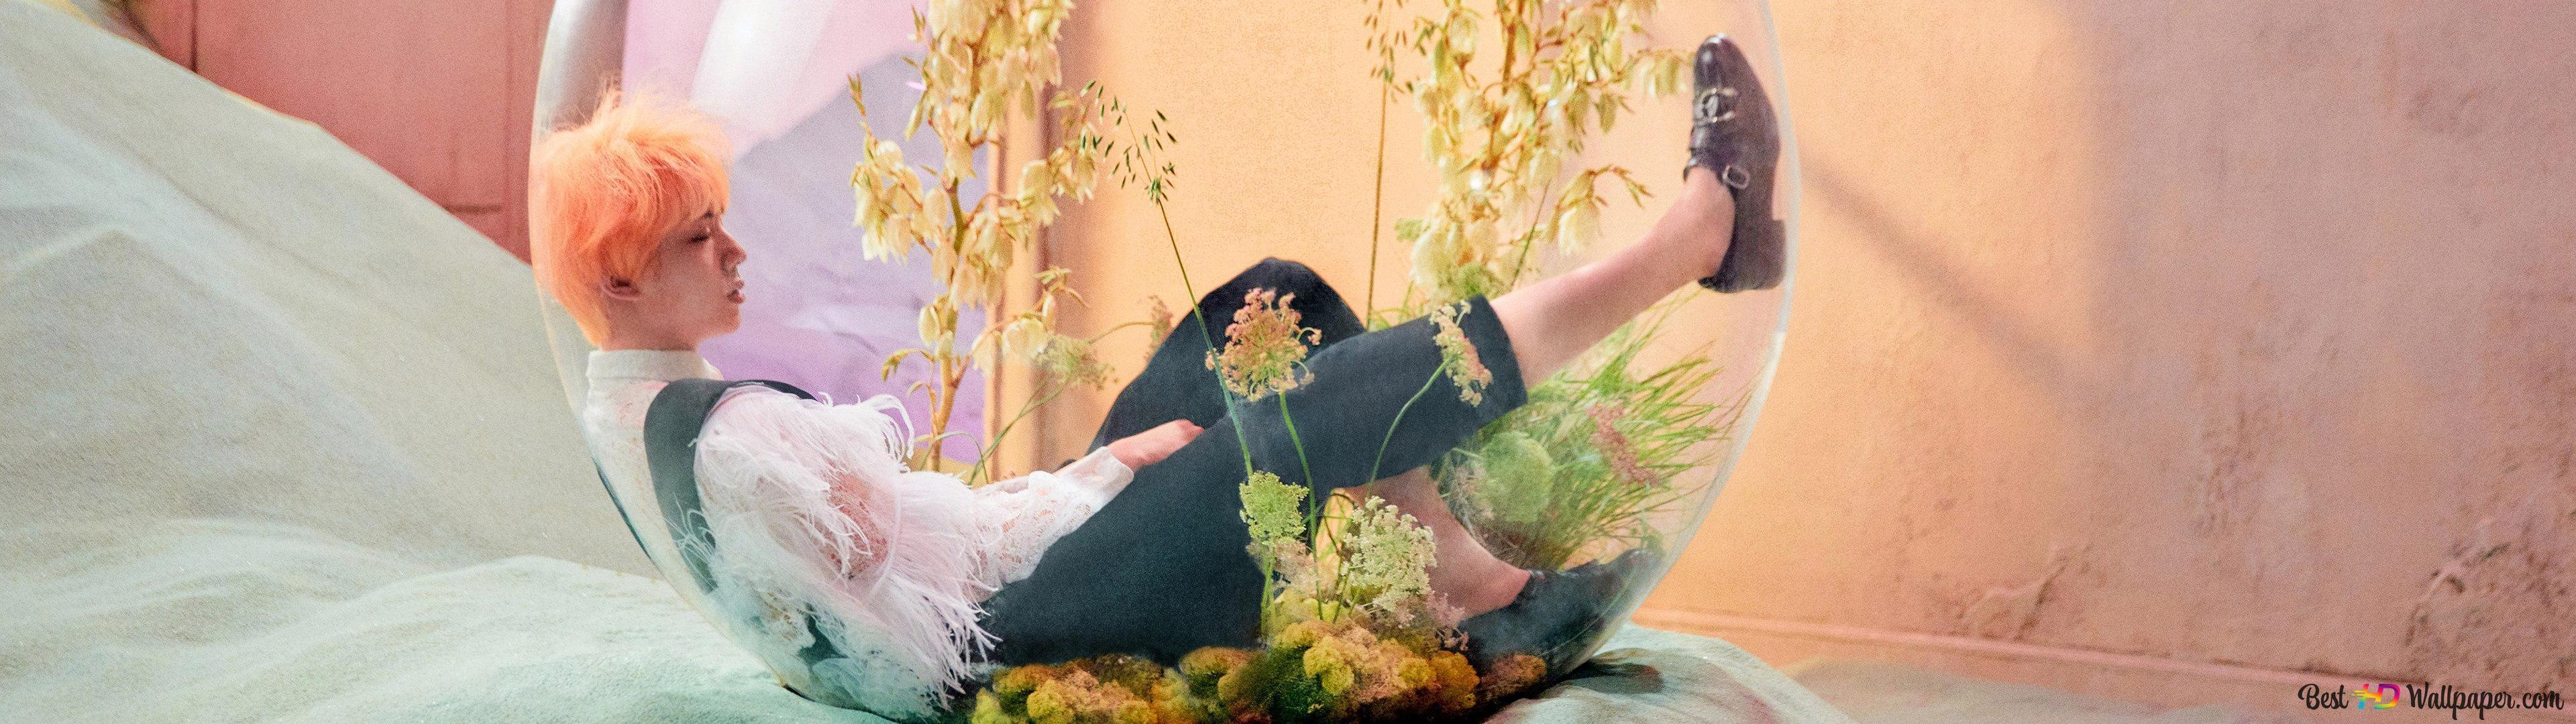 bts jin in love yourself answer mv wallpaper 3840x1080 53625 75